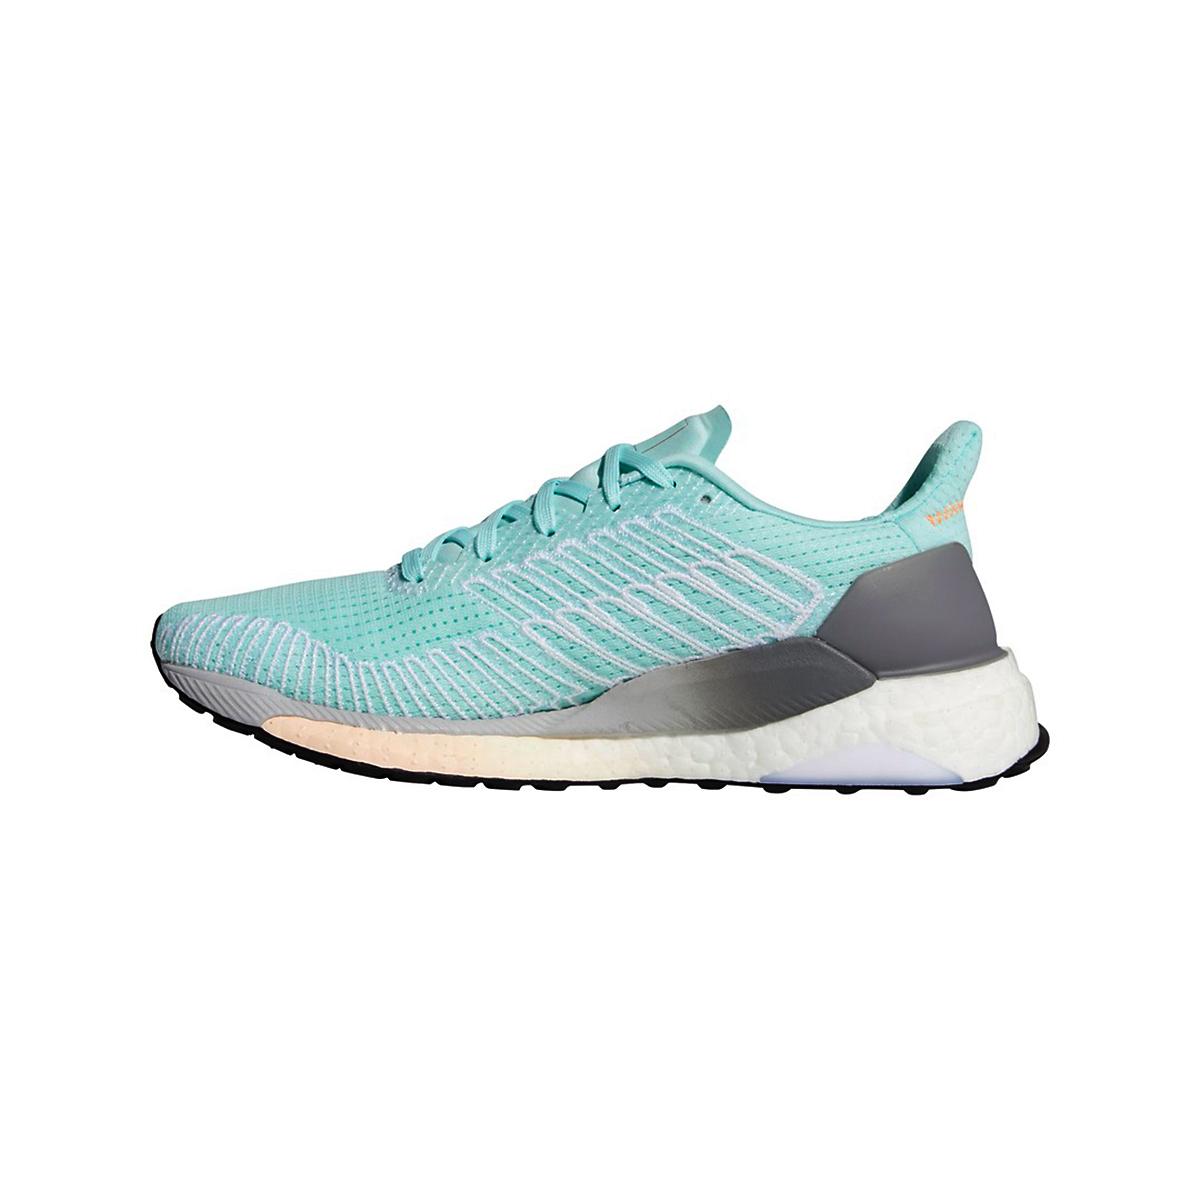 Women's Adidas SolarBOOST 19 Running Shoe - Color: Frost Mint/Silver Metallic/Grey - Size: 5 - Width: Regular, Frost Mint/Silver Metallic/Grey, large, image 2